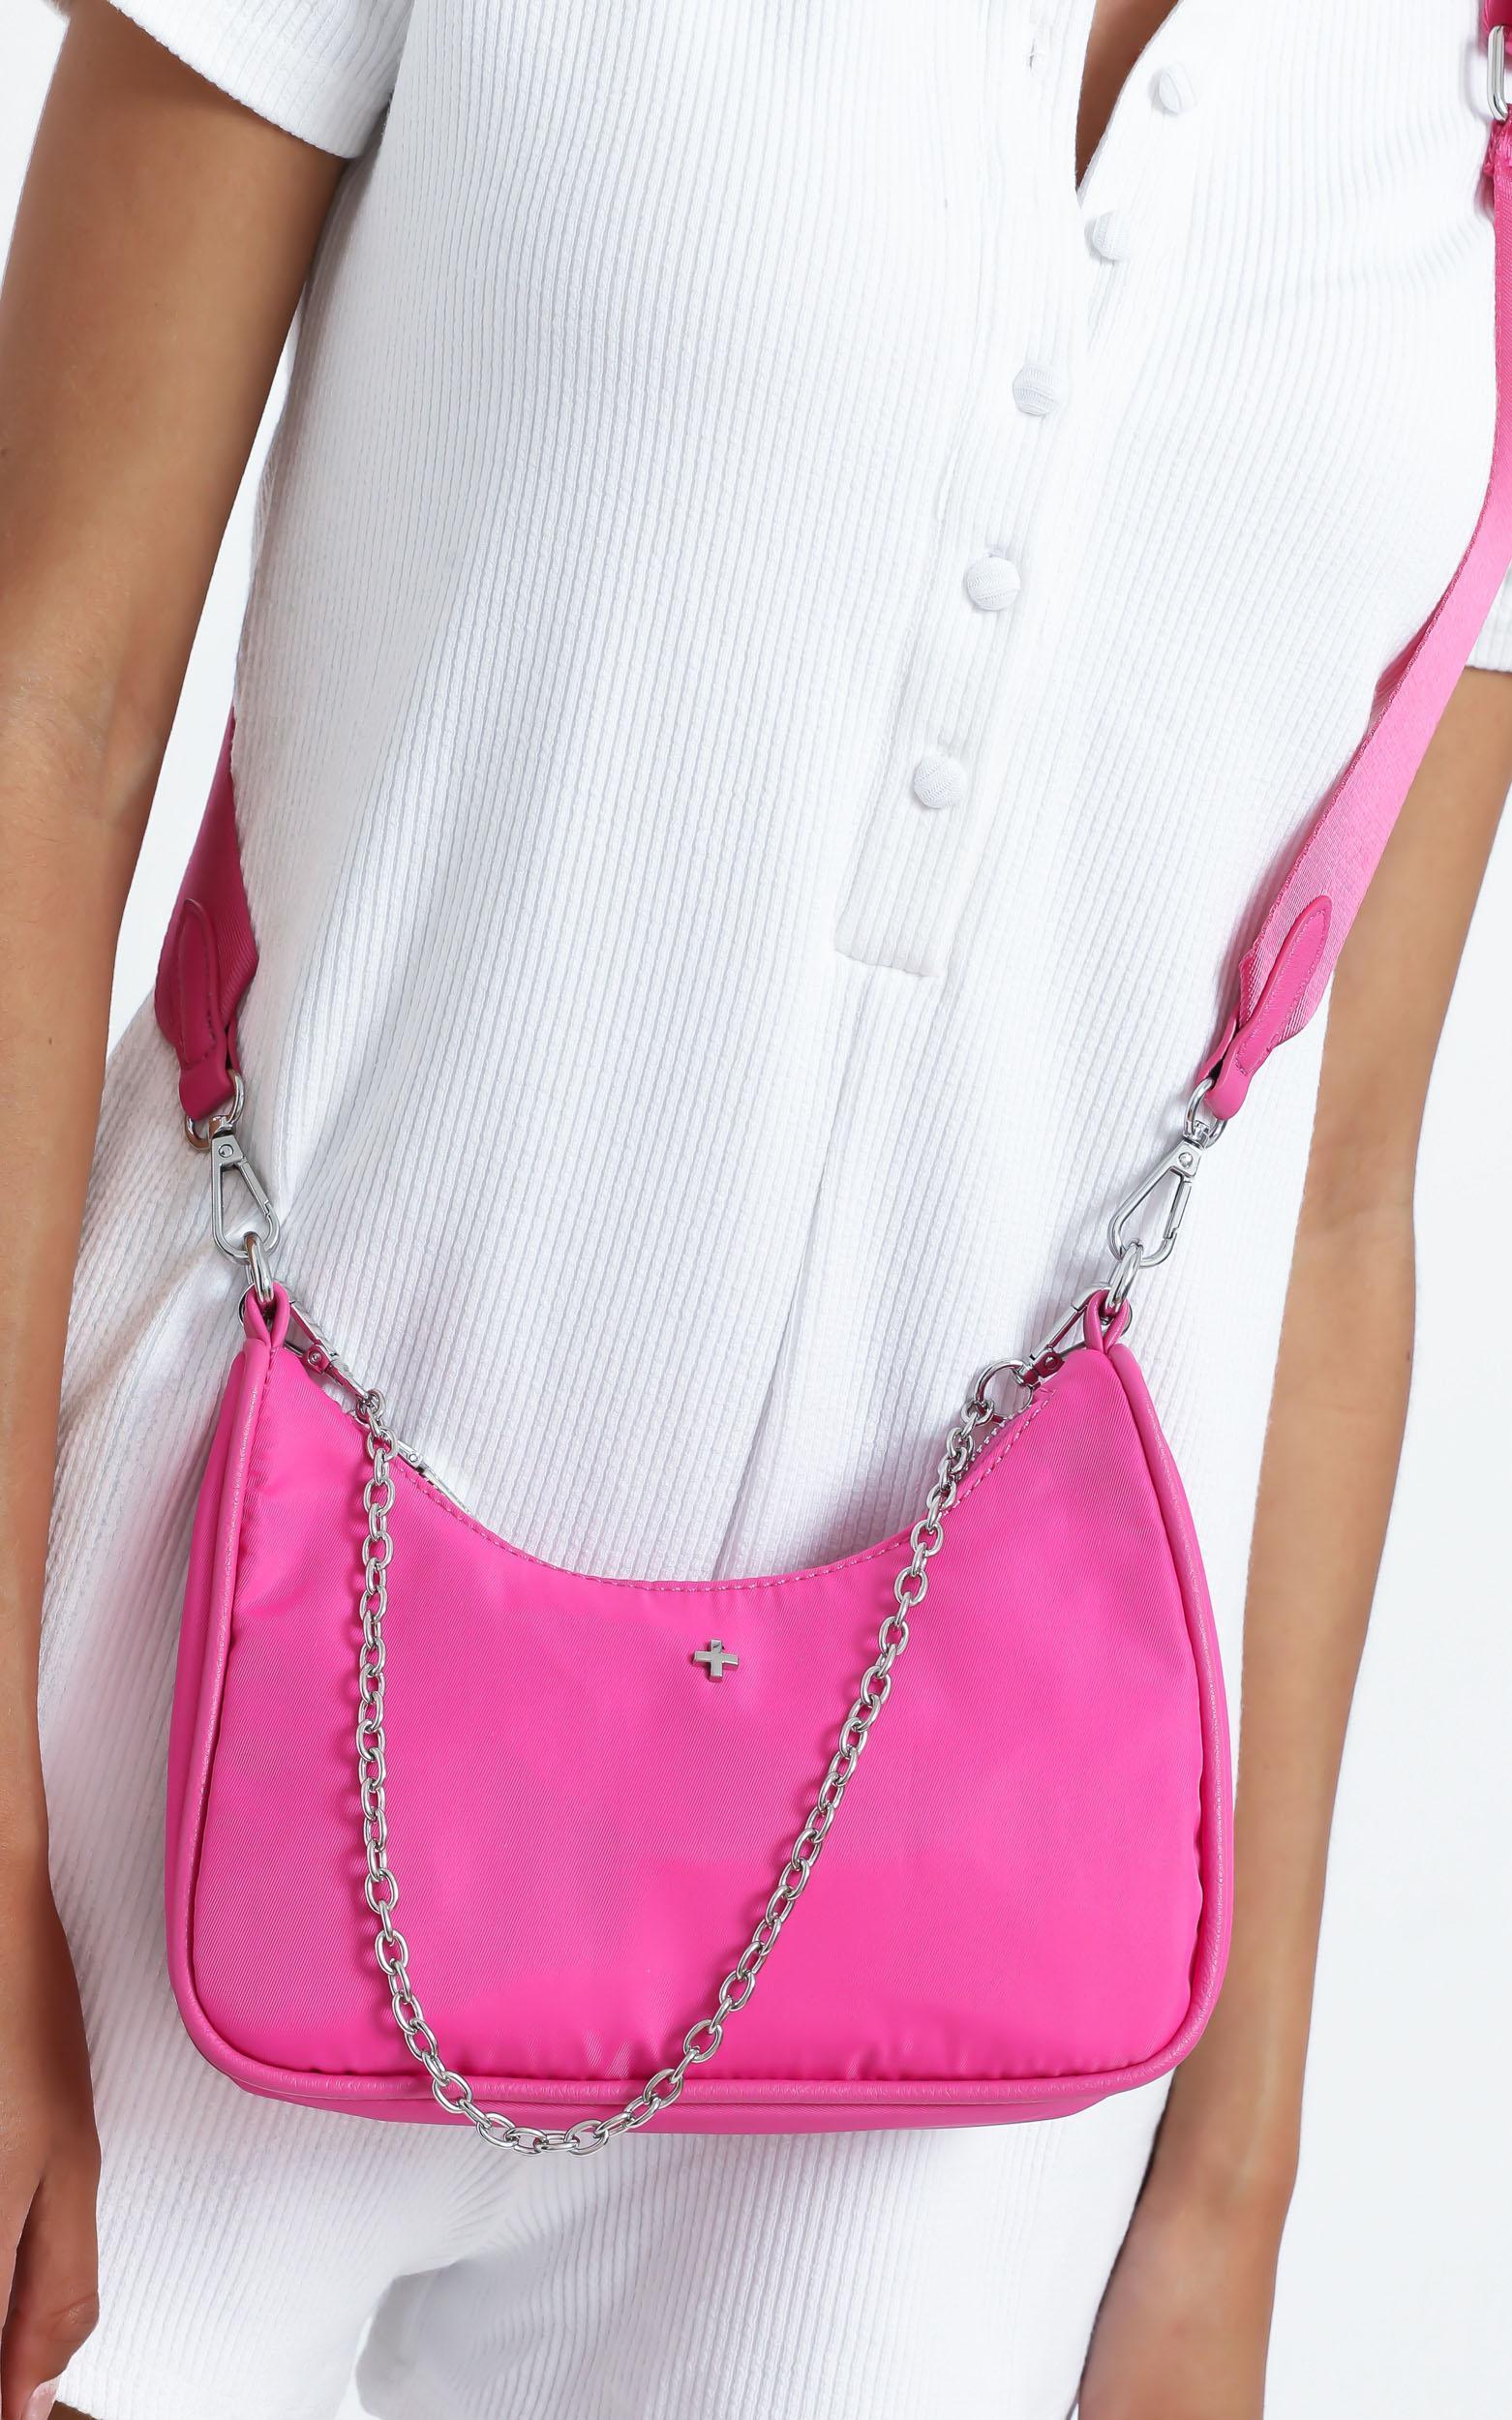 Peta and Jain - Paloma Bag in Hot Pink Nylon, PNK1, hi-res image number null